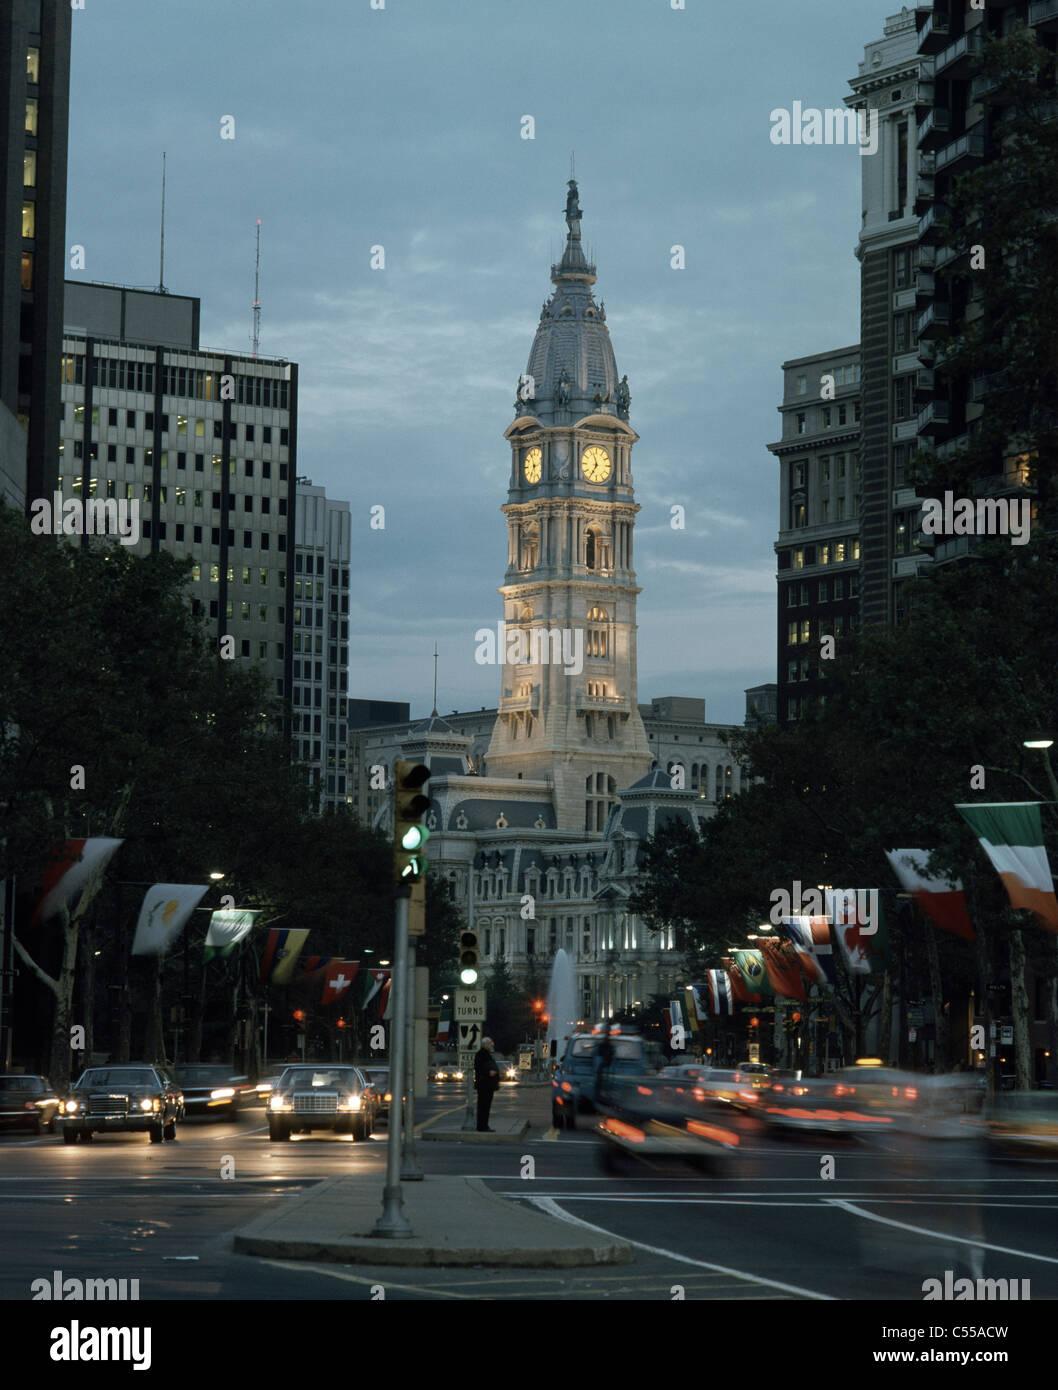 USA, Pennsylvania, Philadelphia, Benjamin Franklin Parkway und City Hall in der Abenddämmerung Stockfoto